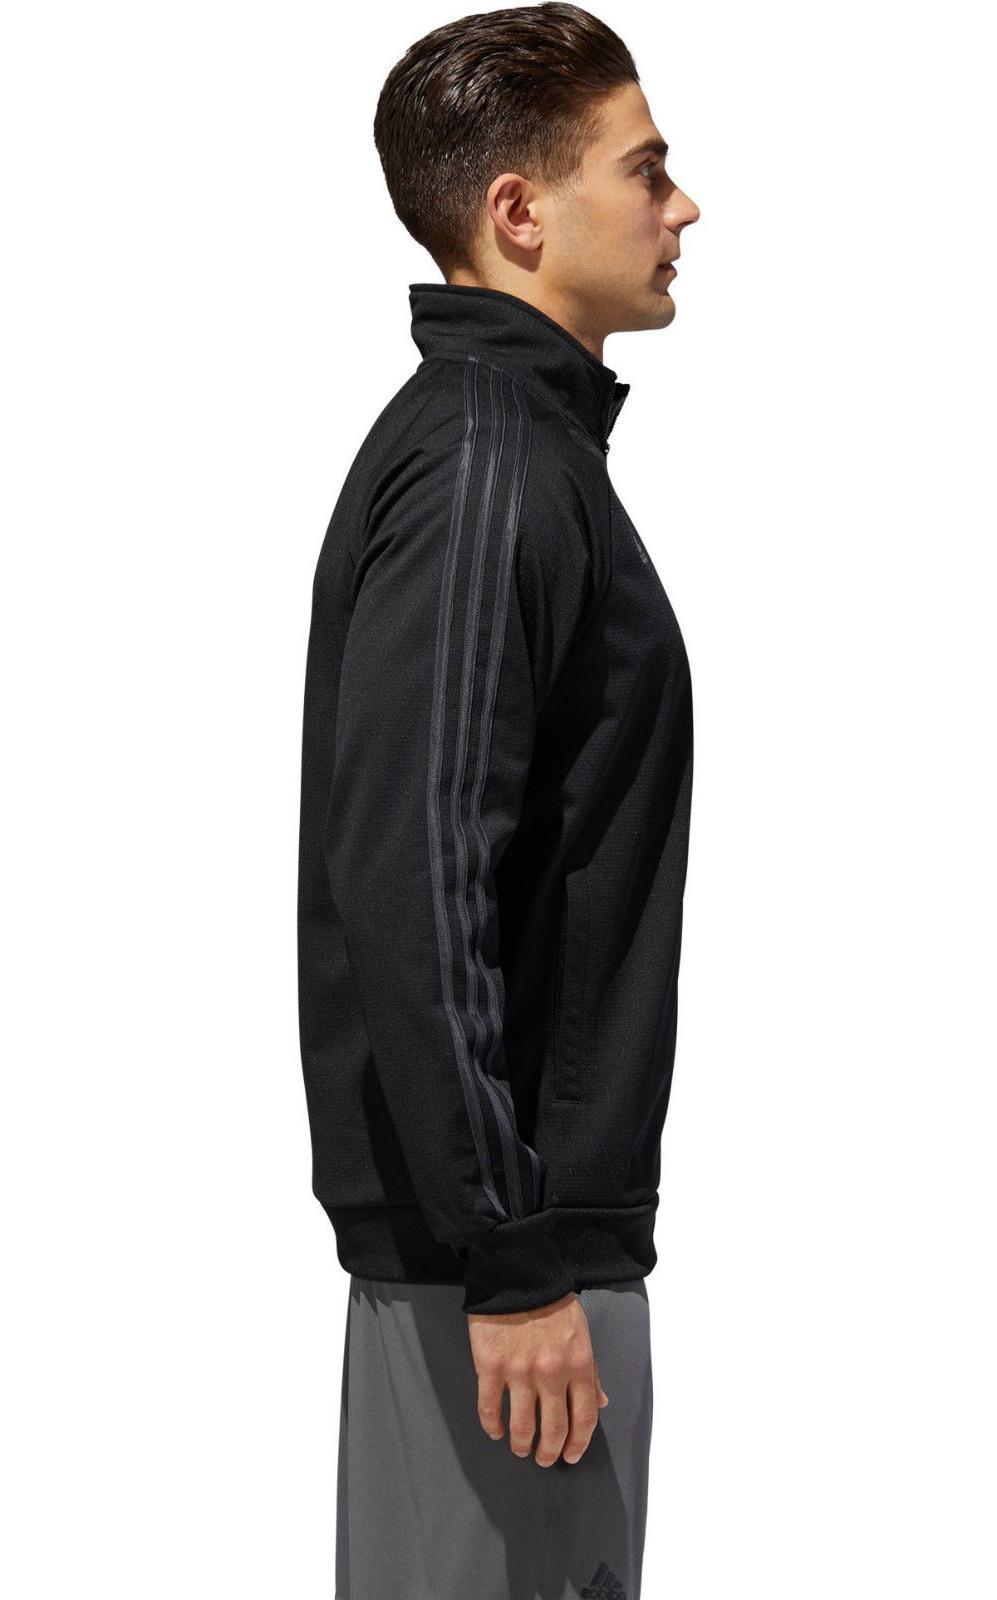 Mens Jacket Black Zip Long Sleeve Shirt L-XXL